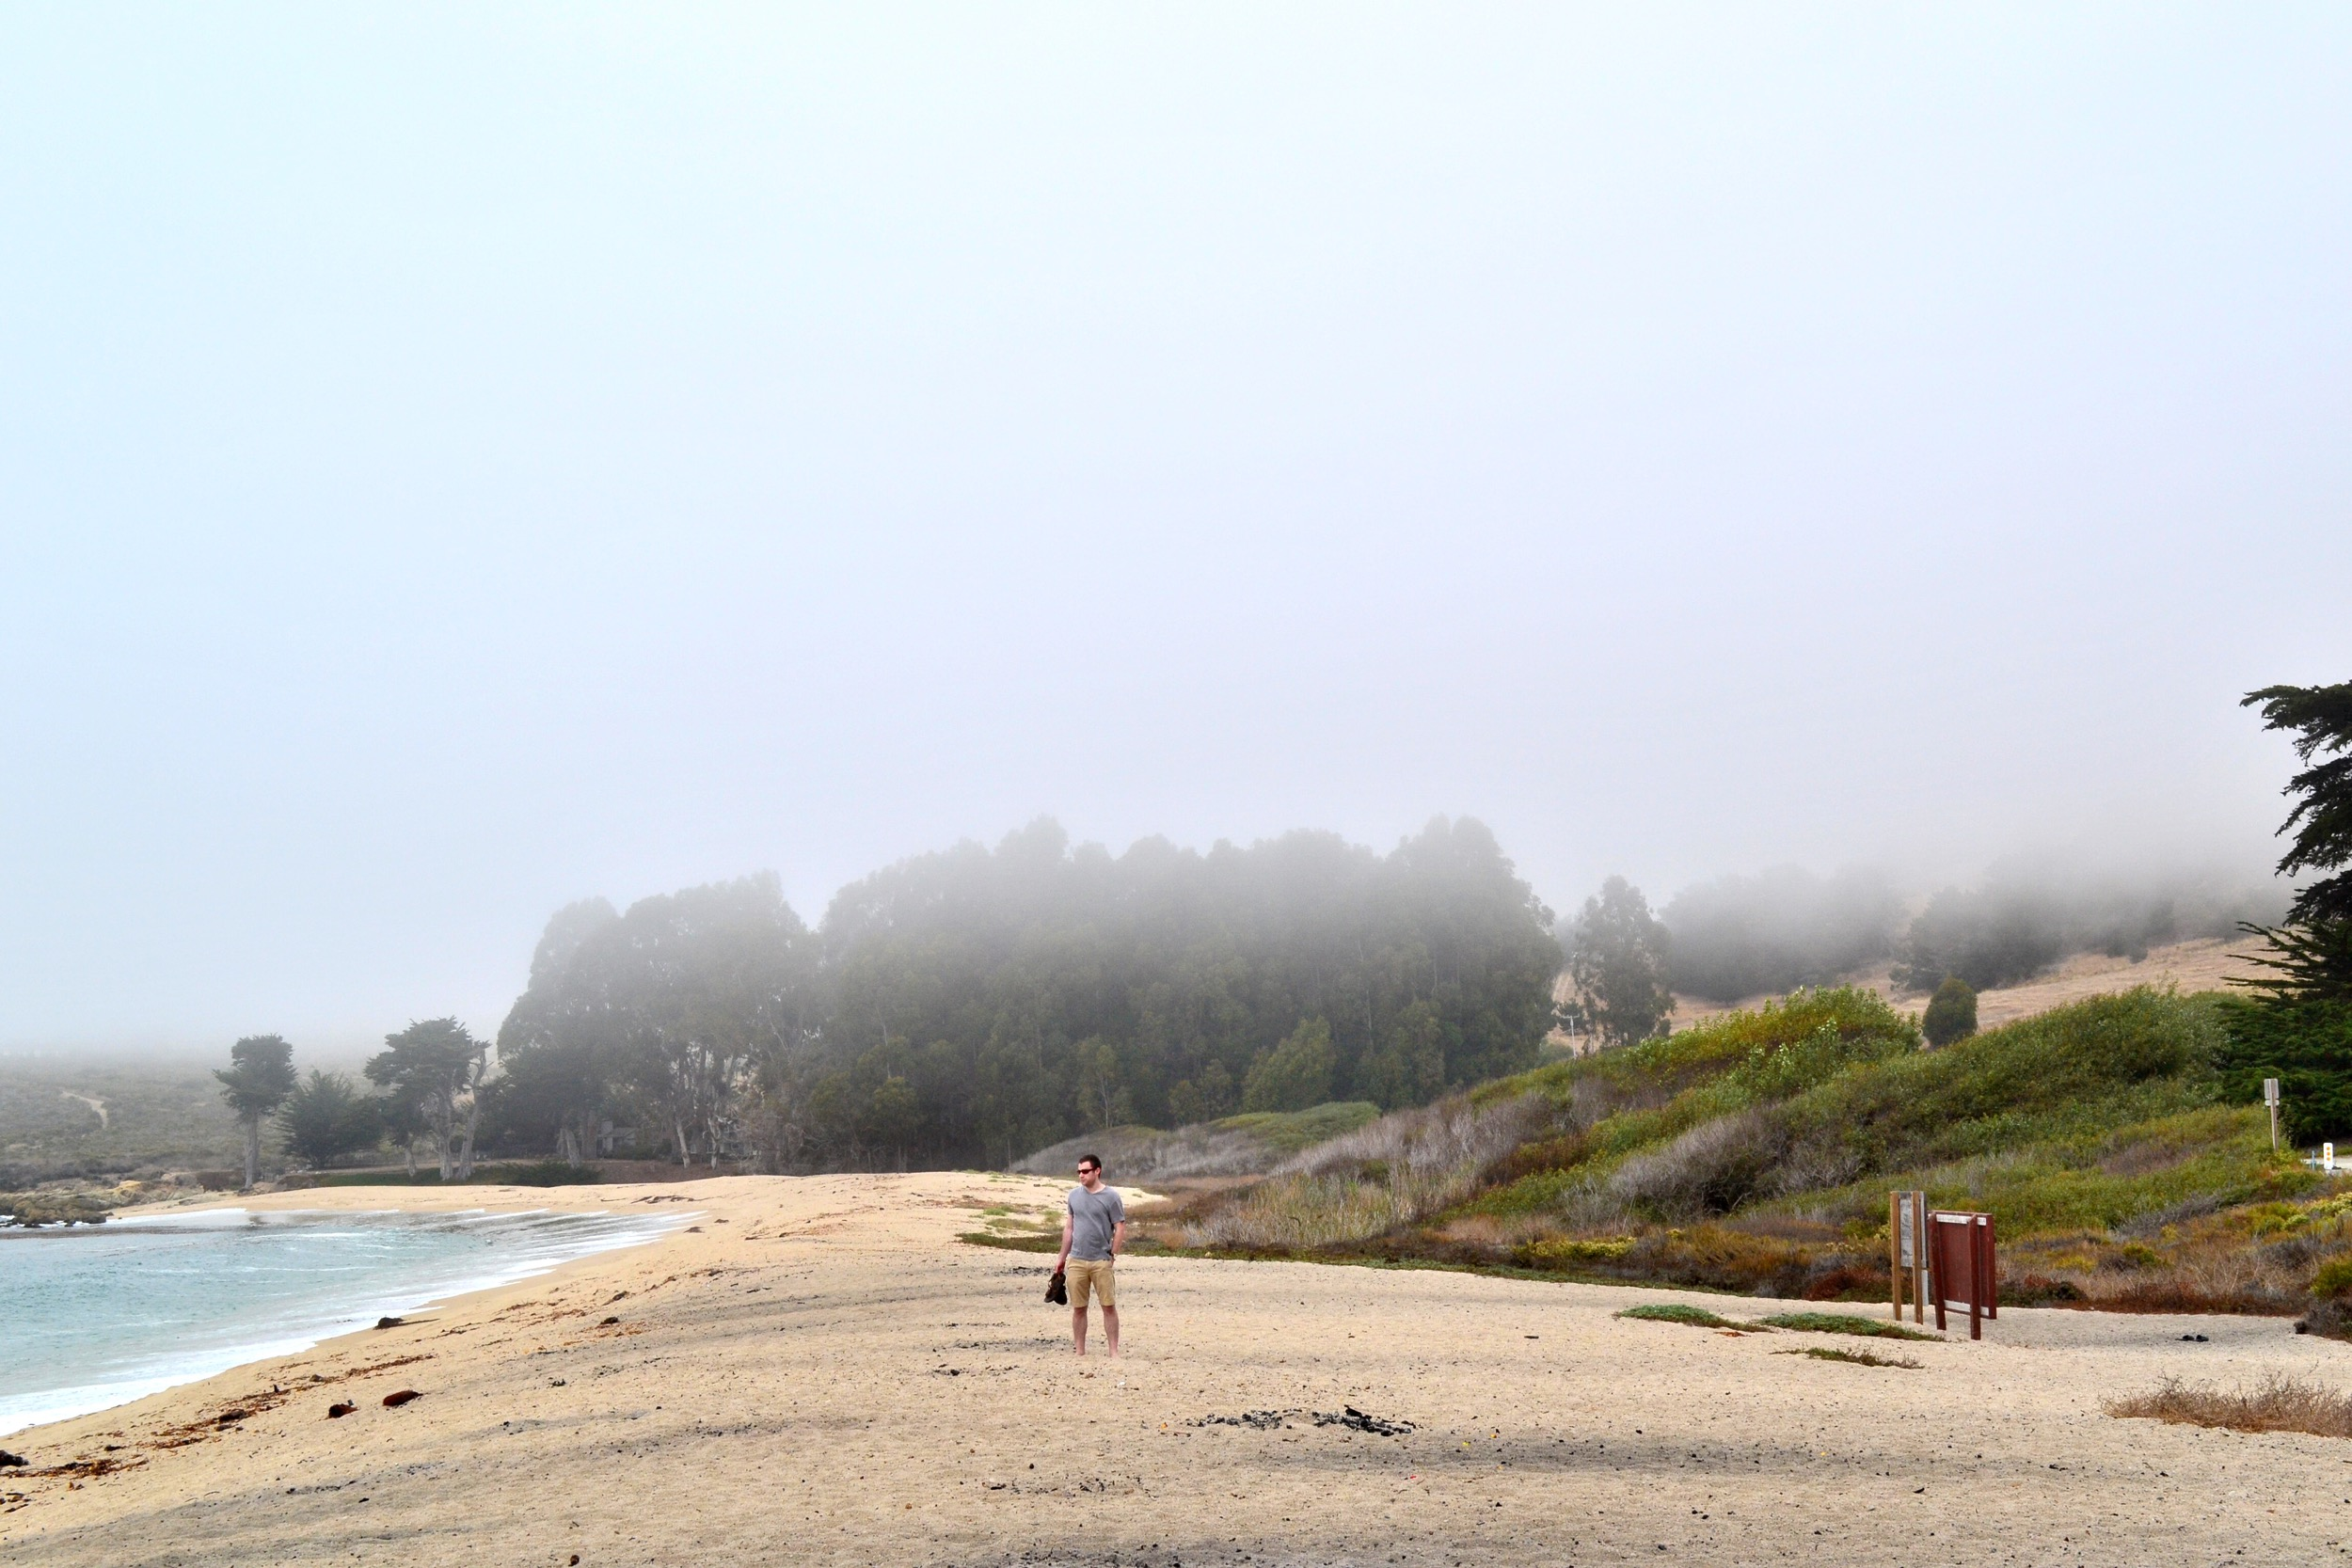 xan on beach.jpg